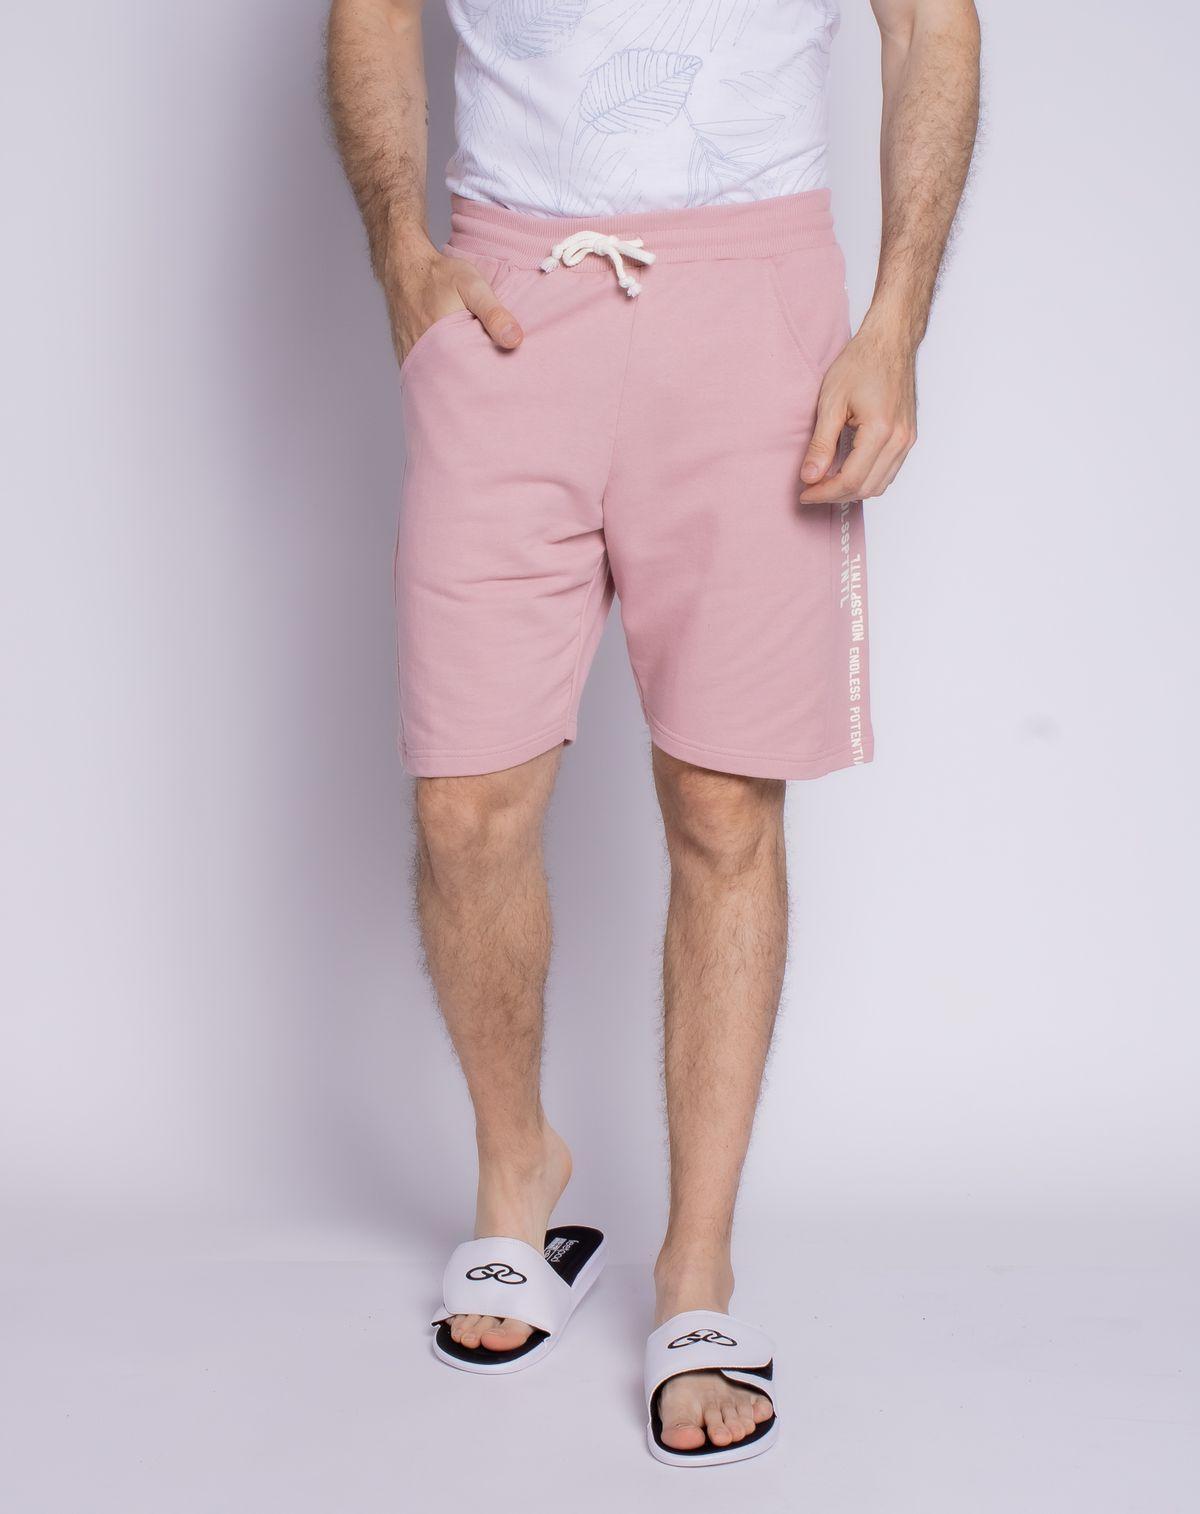 597660006-bermuda-moletom-masculina-bolsos-estampada-rose-g-9f2